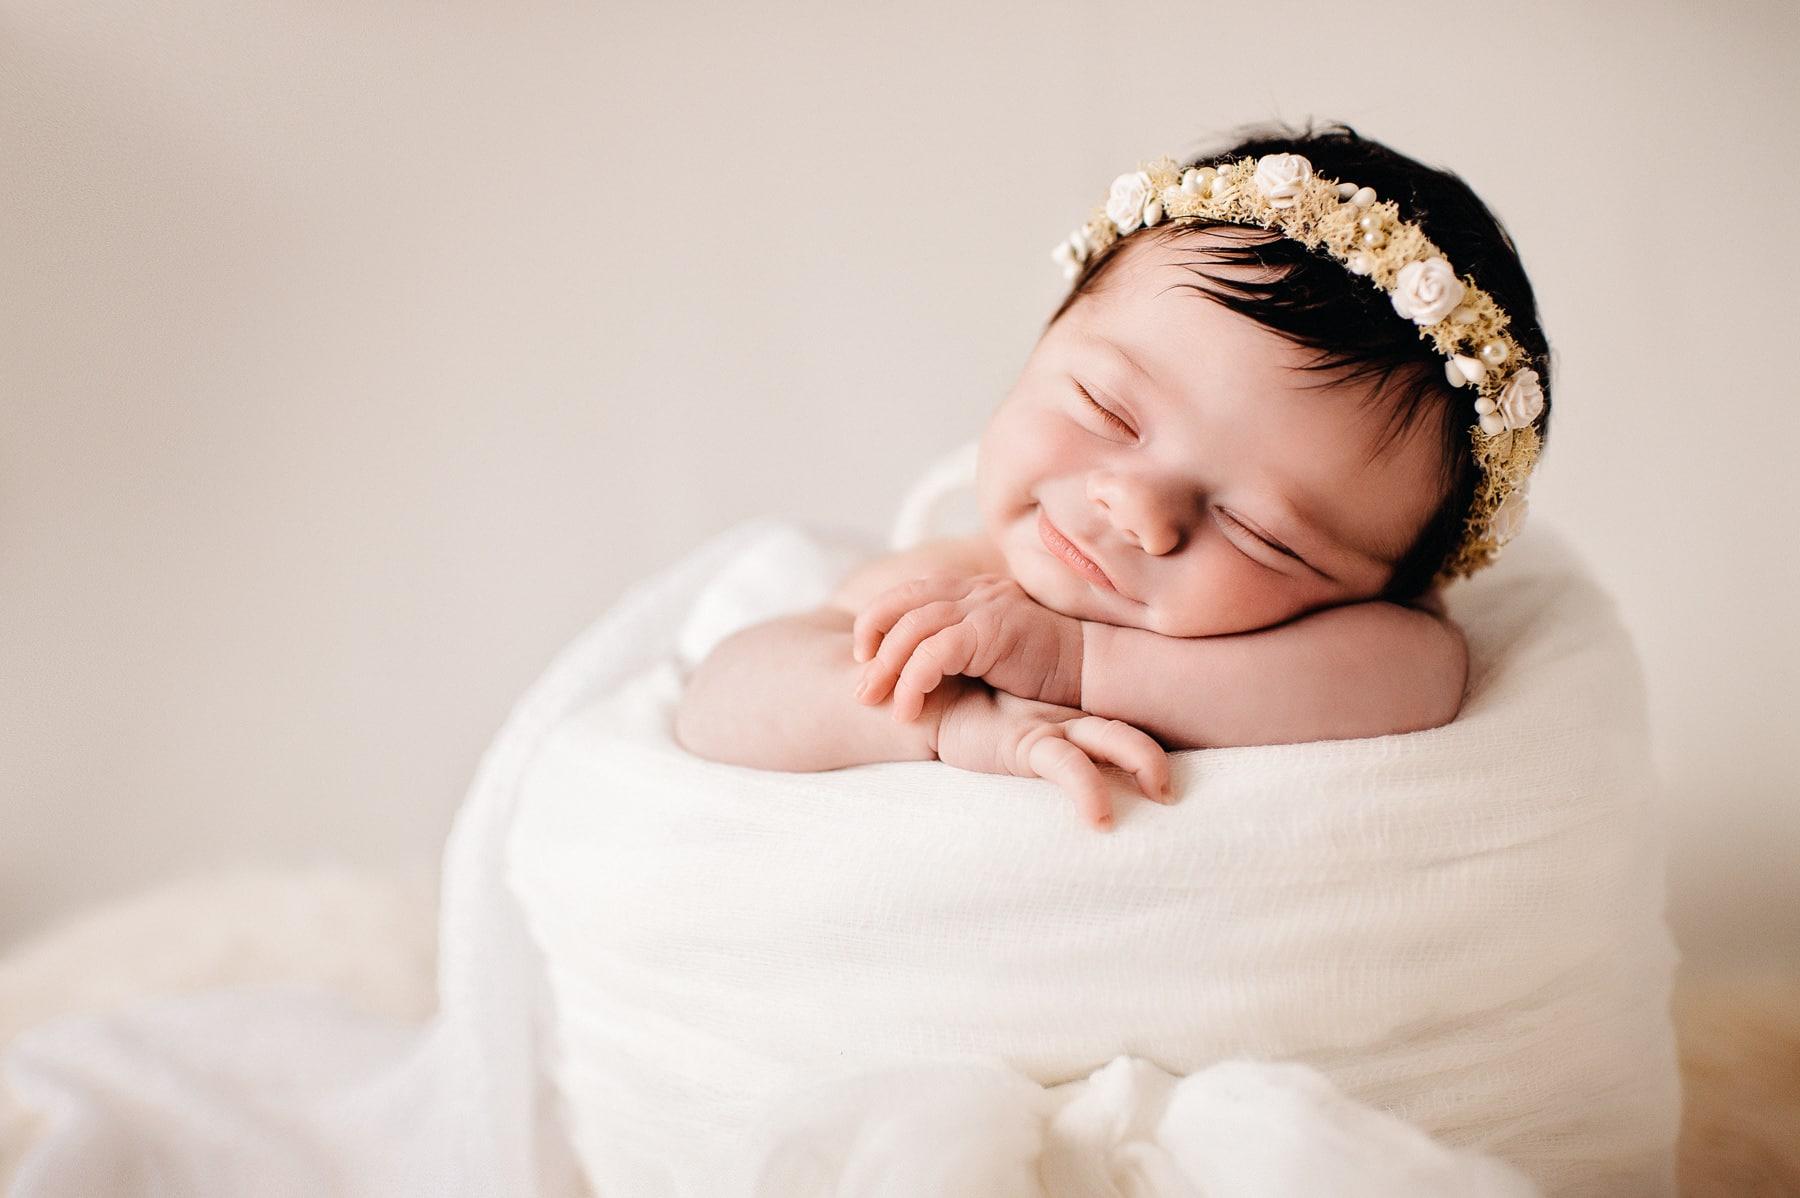 newborn in basket smiling